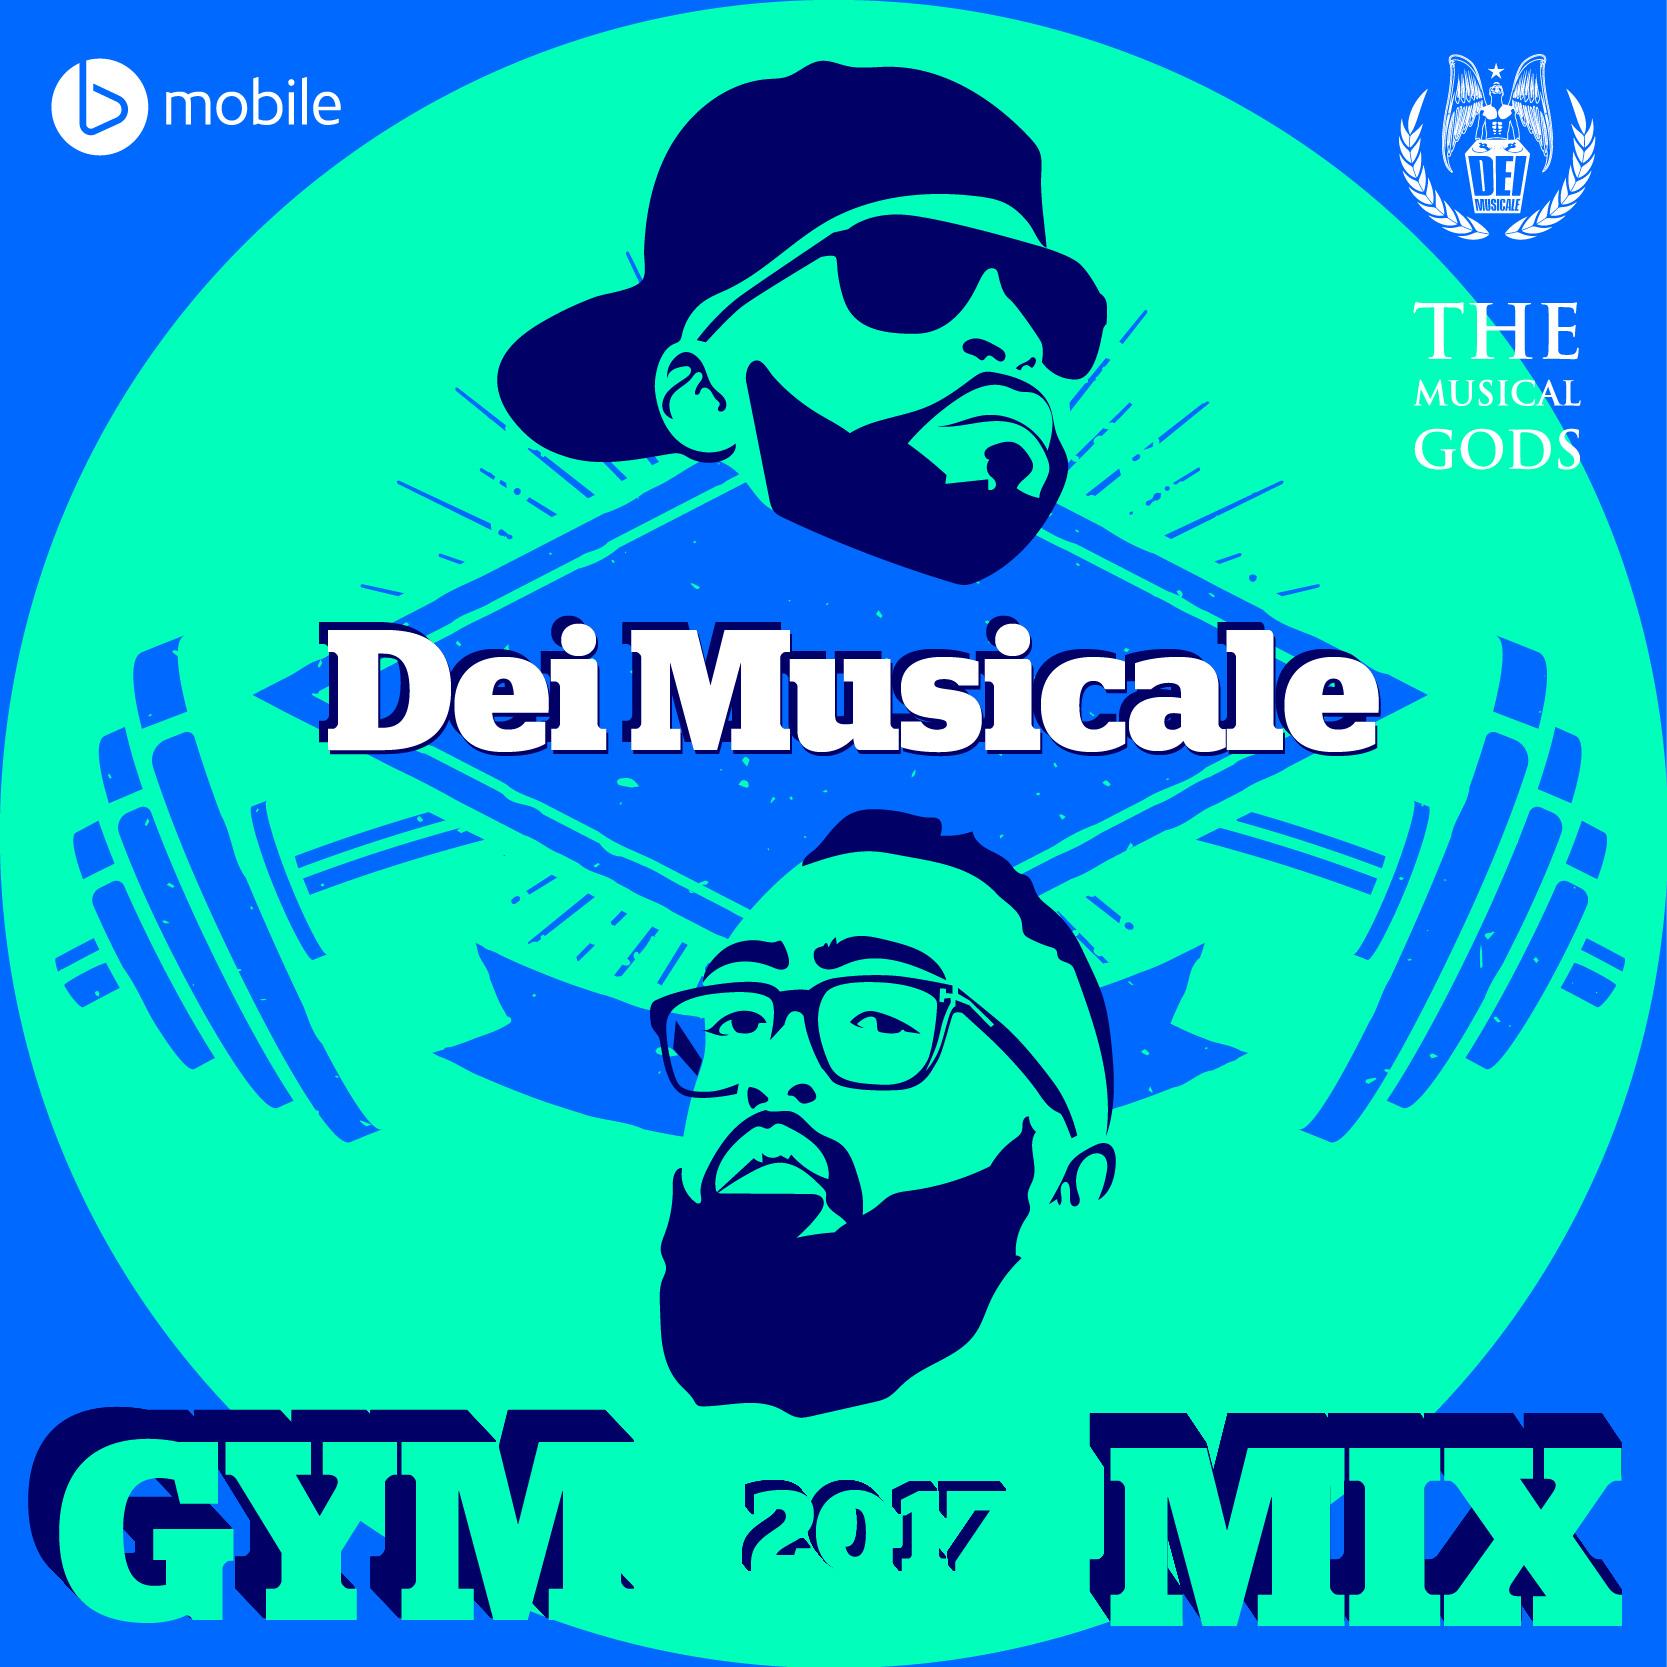 dei musical mix tape cover-01.jpg